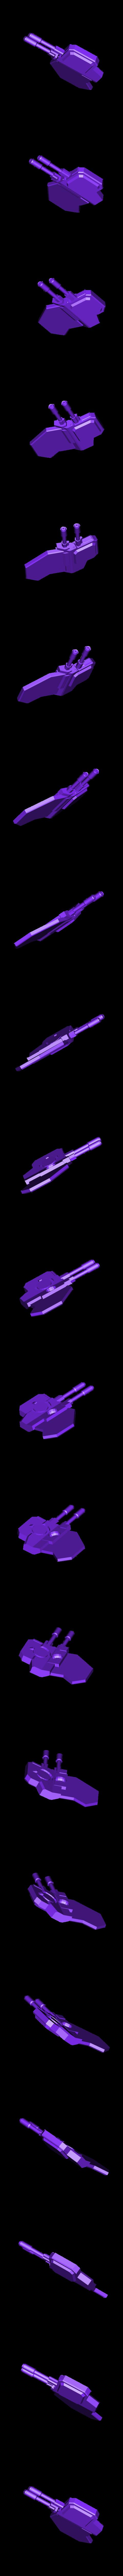 Locust_Statue_Mech_Arm_L.stl Download free STL file MechWarrior Online Locust Statue • 3D printer object, Solid_Alexei